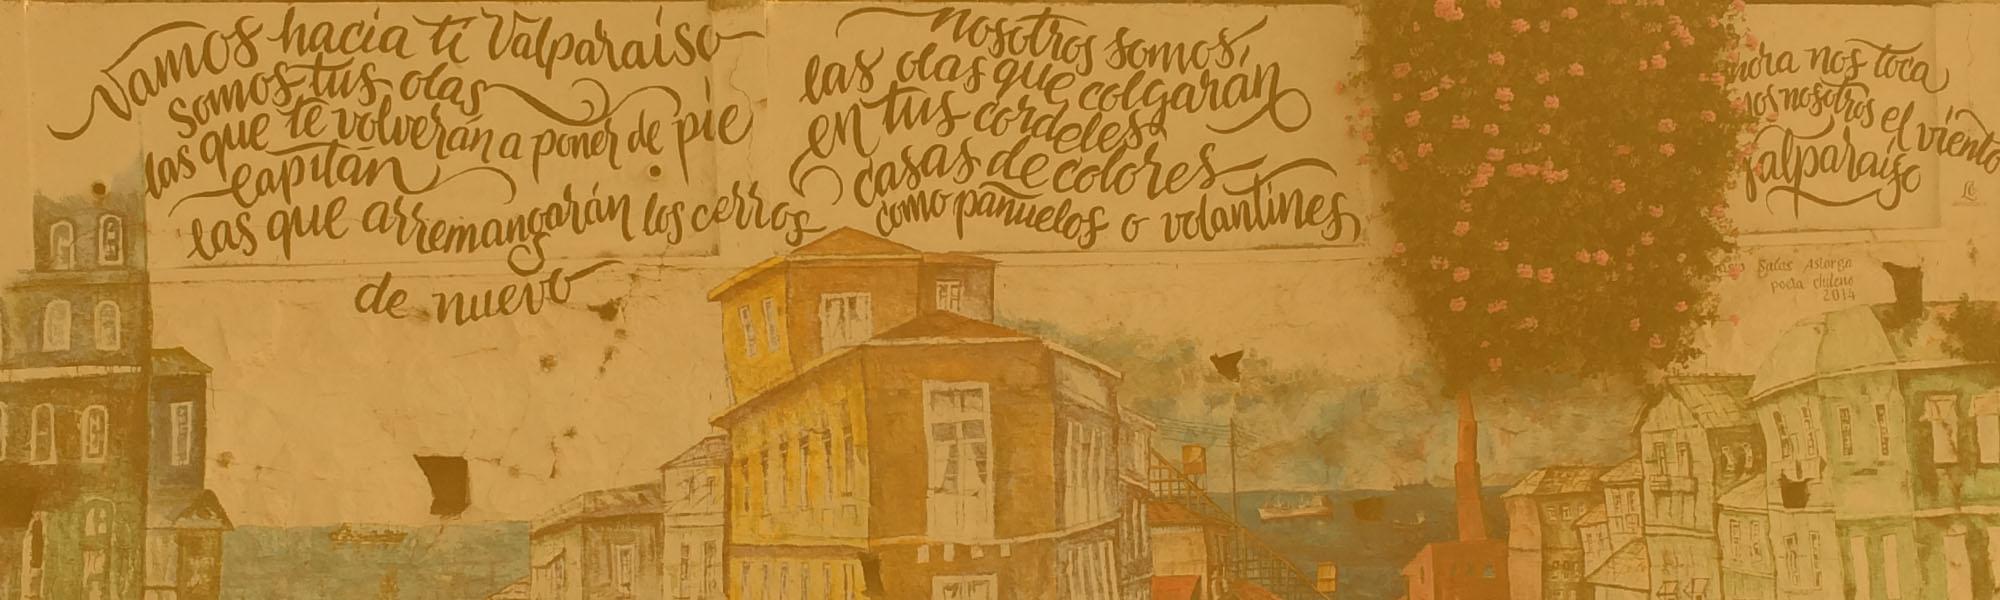 Viaje a Chile: en Valparaíso